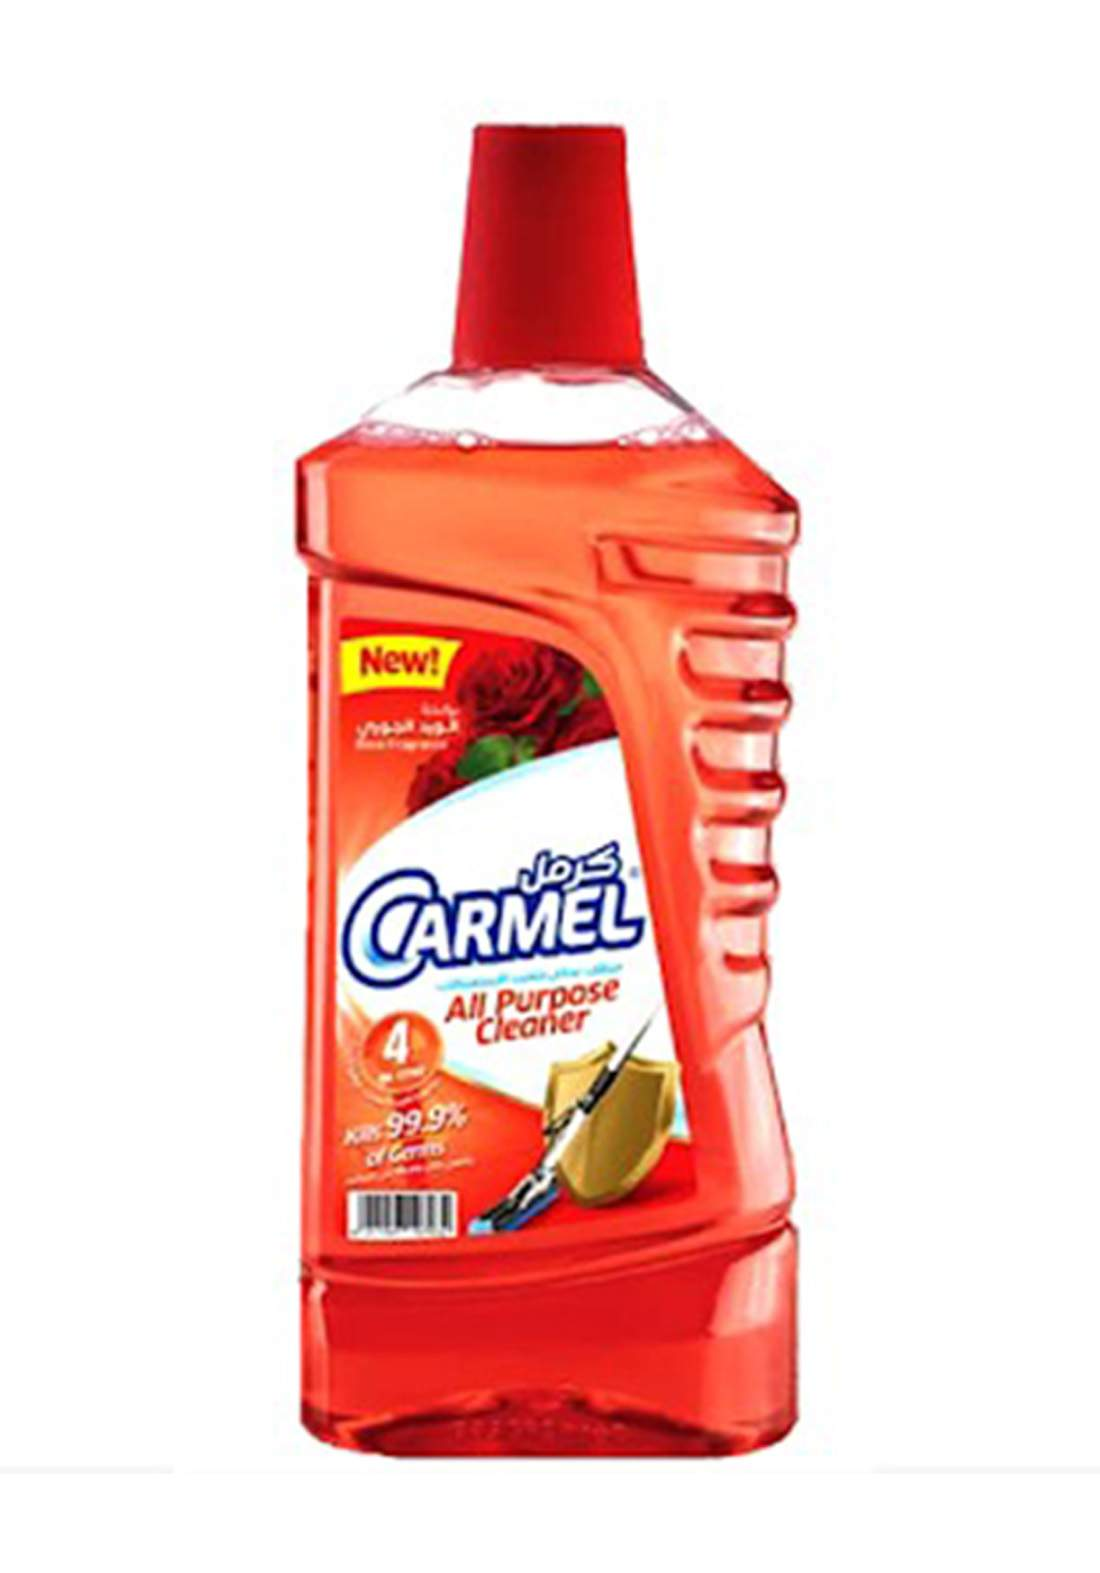 Carmel All Purpose Cleaner منظف كرمل